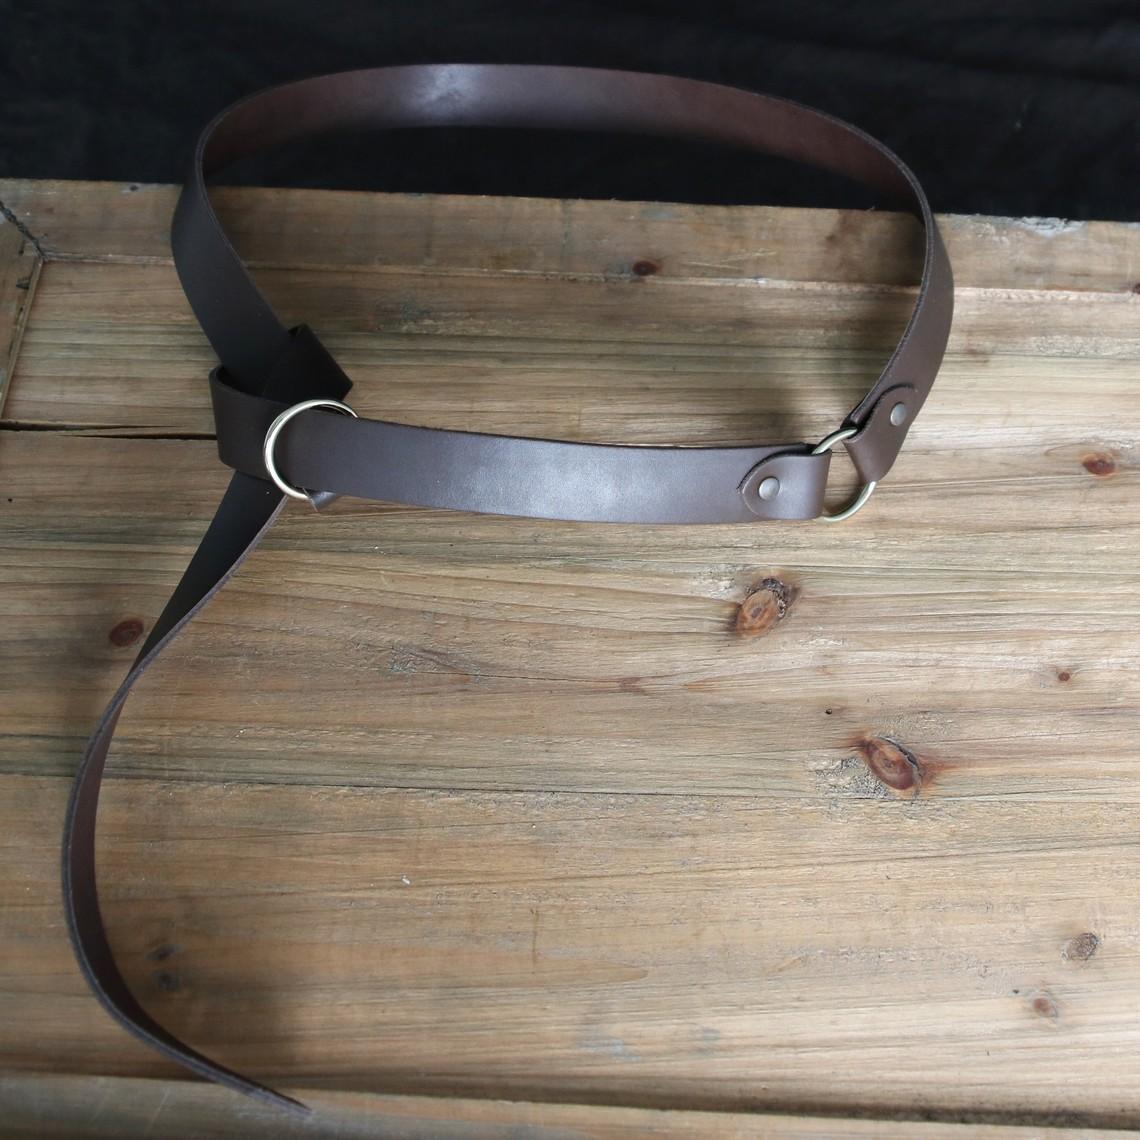 Ceinture en cuir avec boucle en anneau, cuir fendu brun